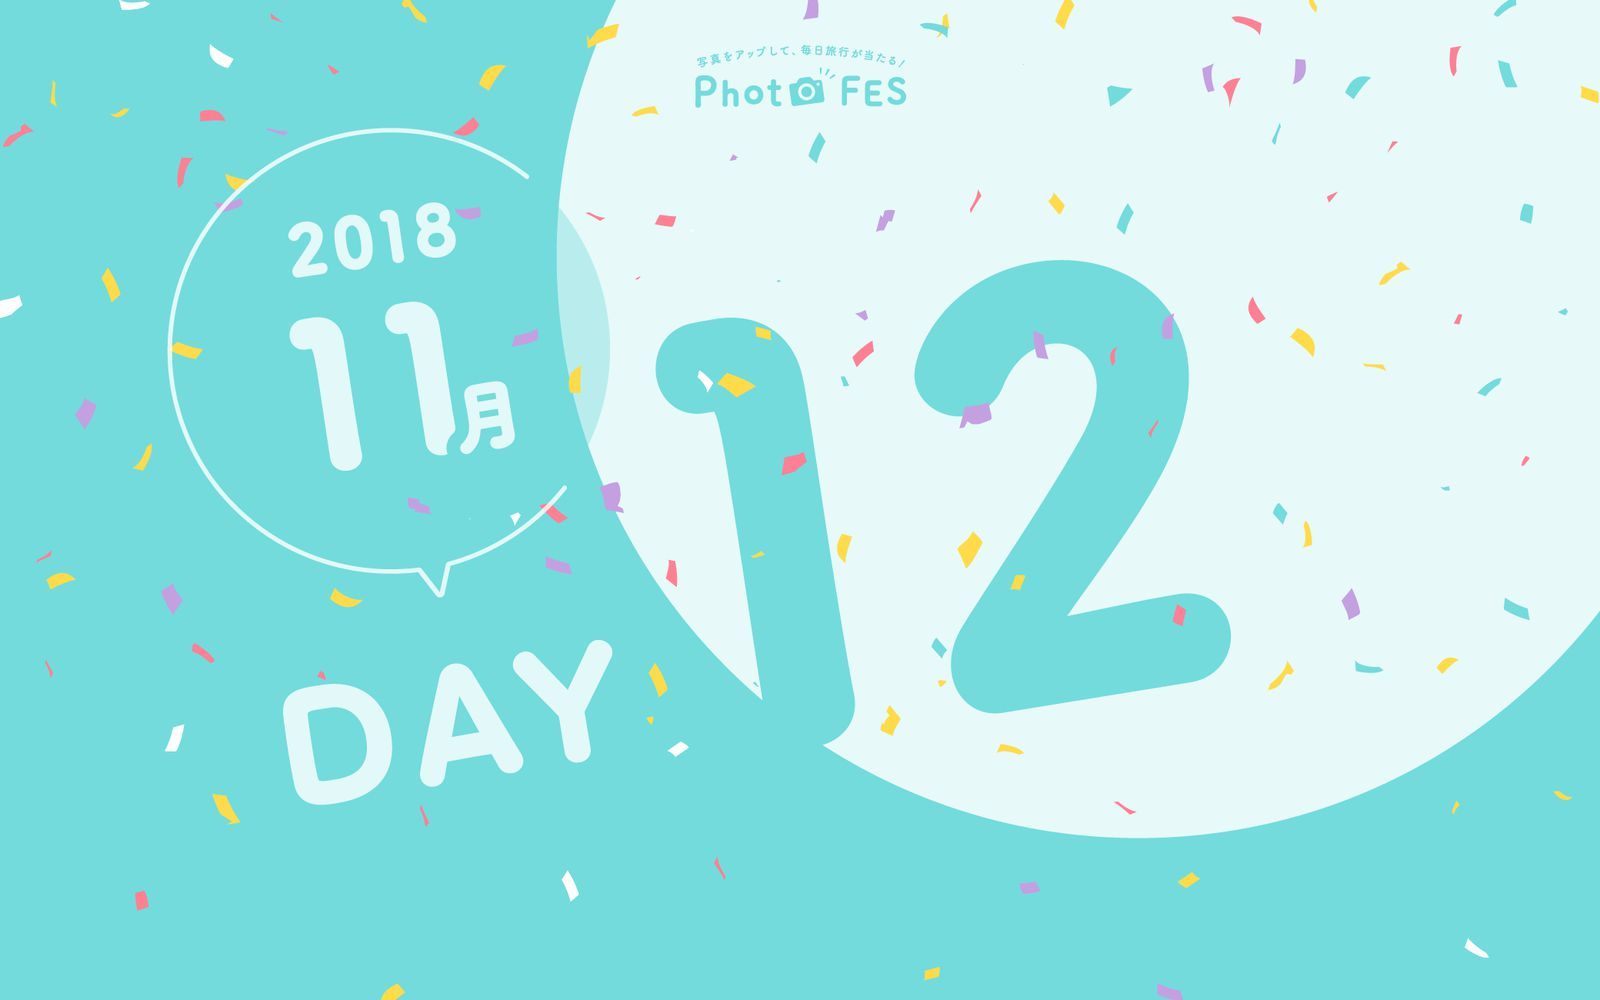 【DAY12】「Photo FES 2018 Autumn」11月12日投稿分であたる賞品&受賞者発表